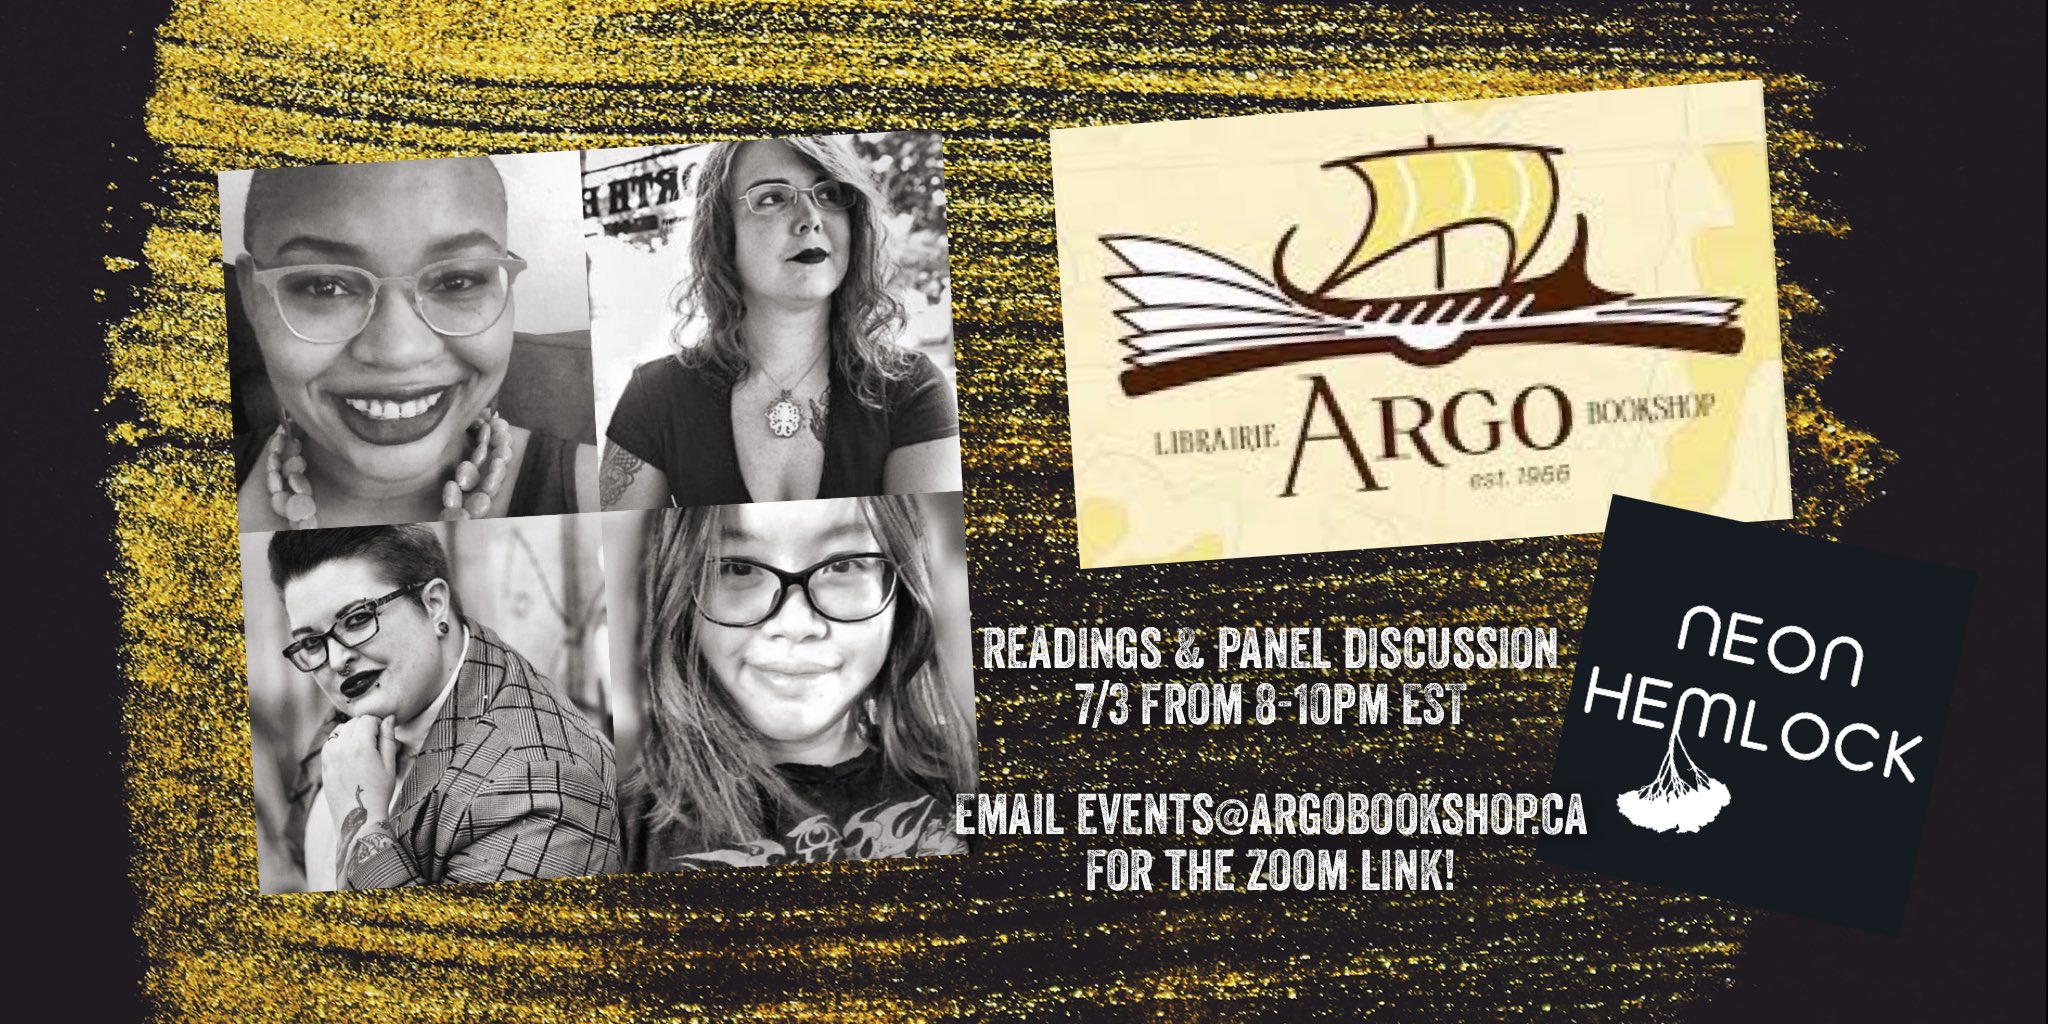 Argo Bookstore Reading Image